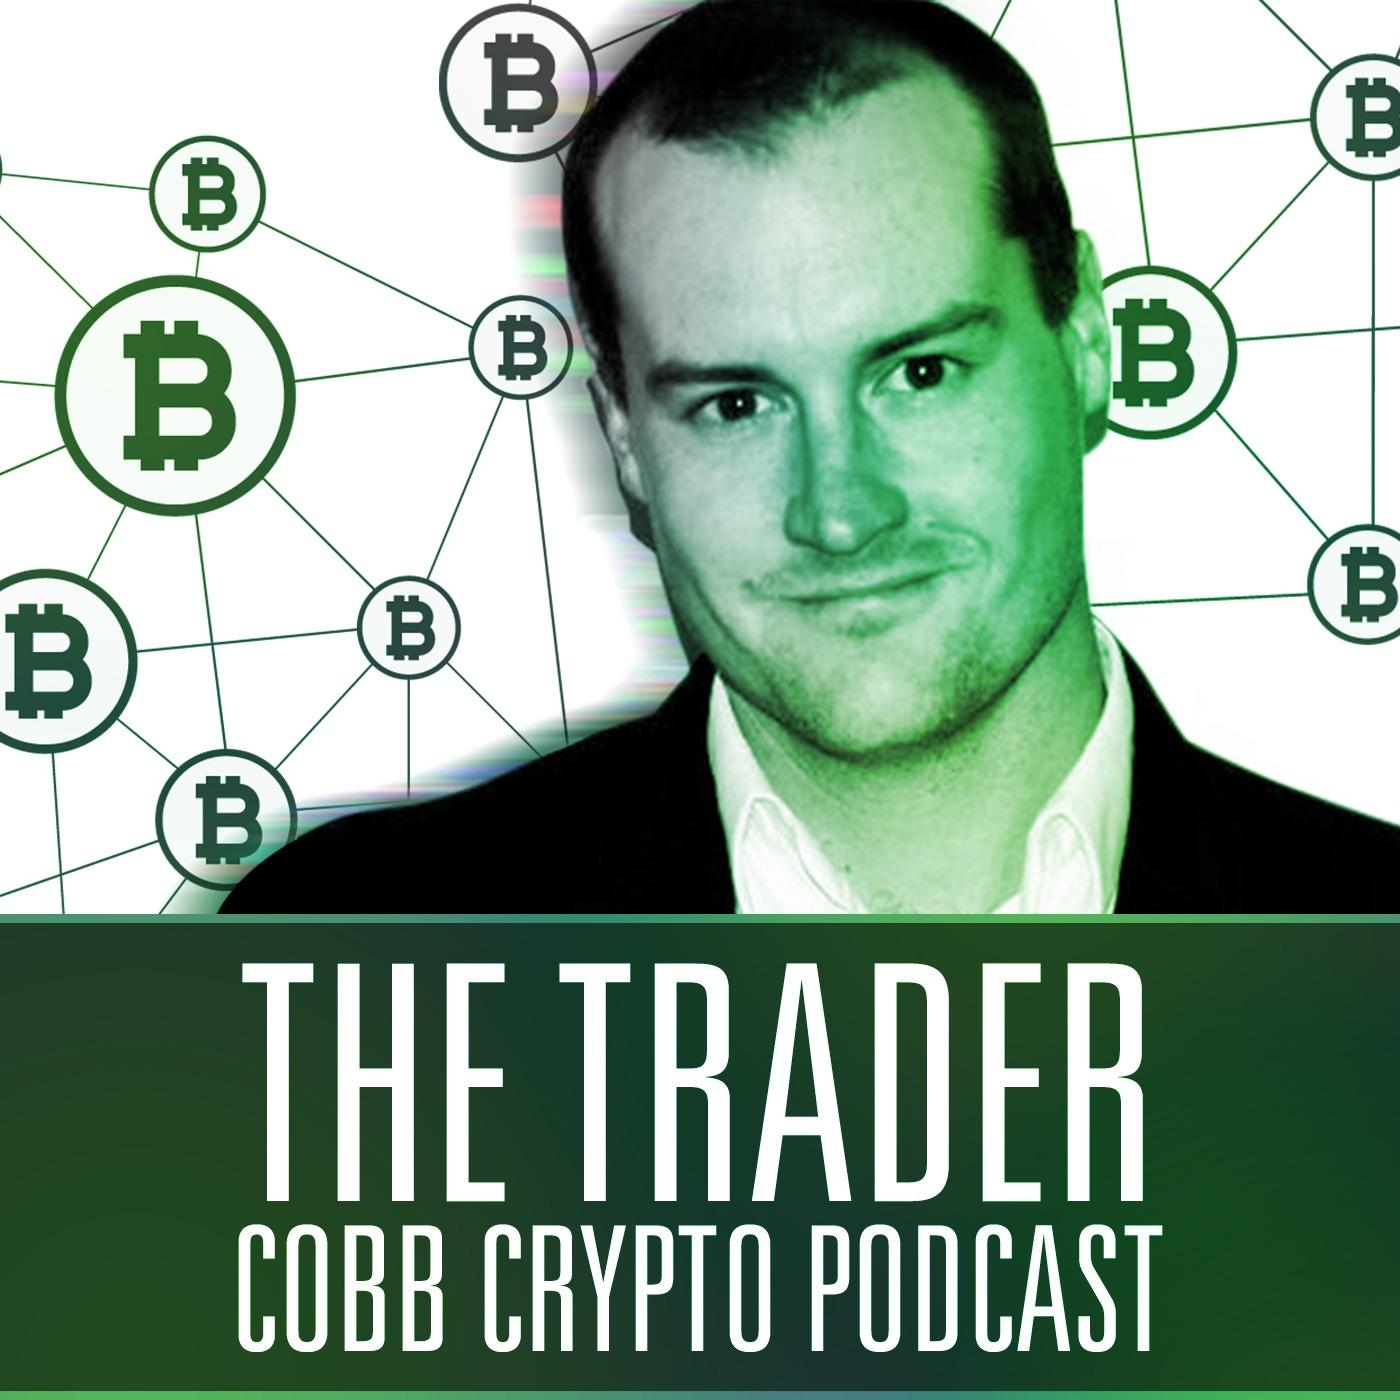 Should a losing trade stop you?